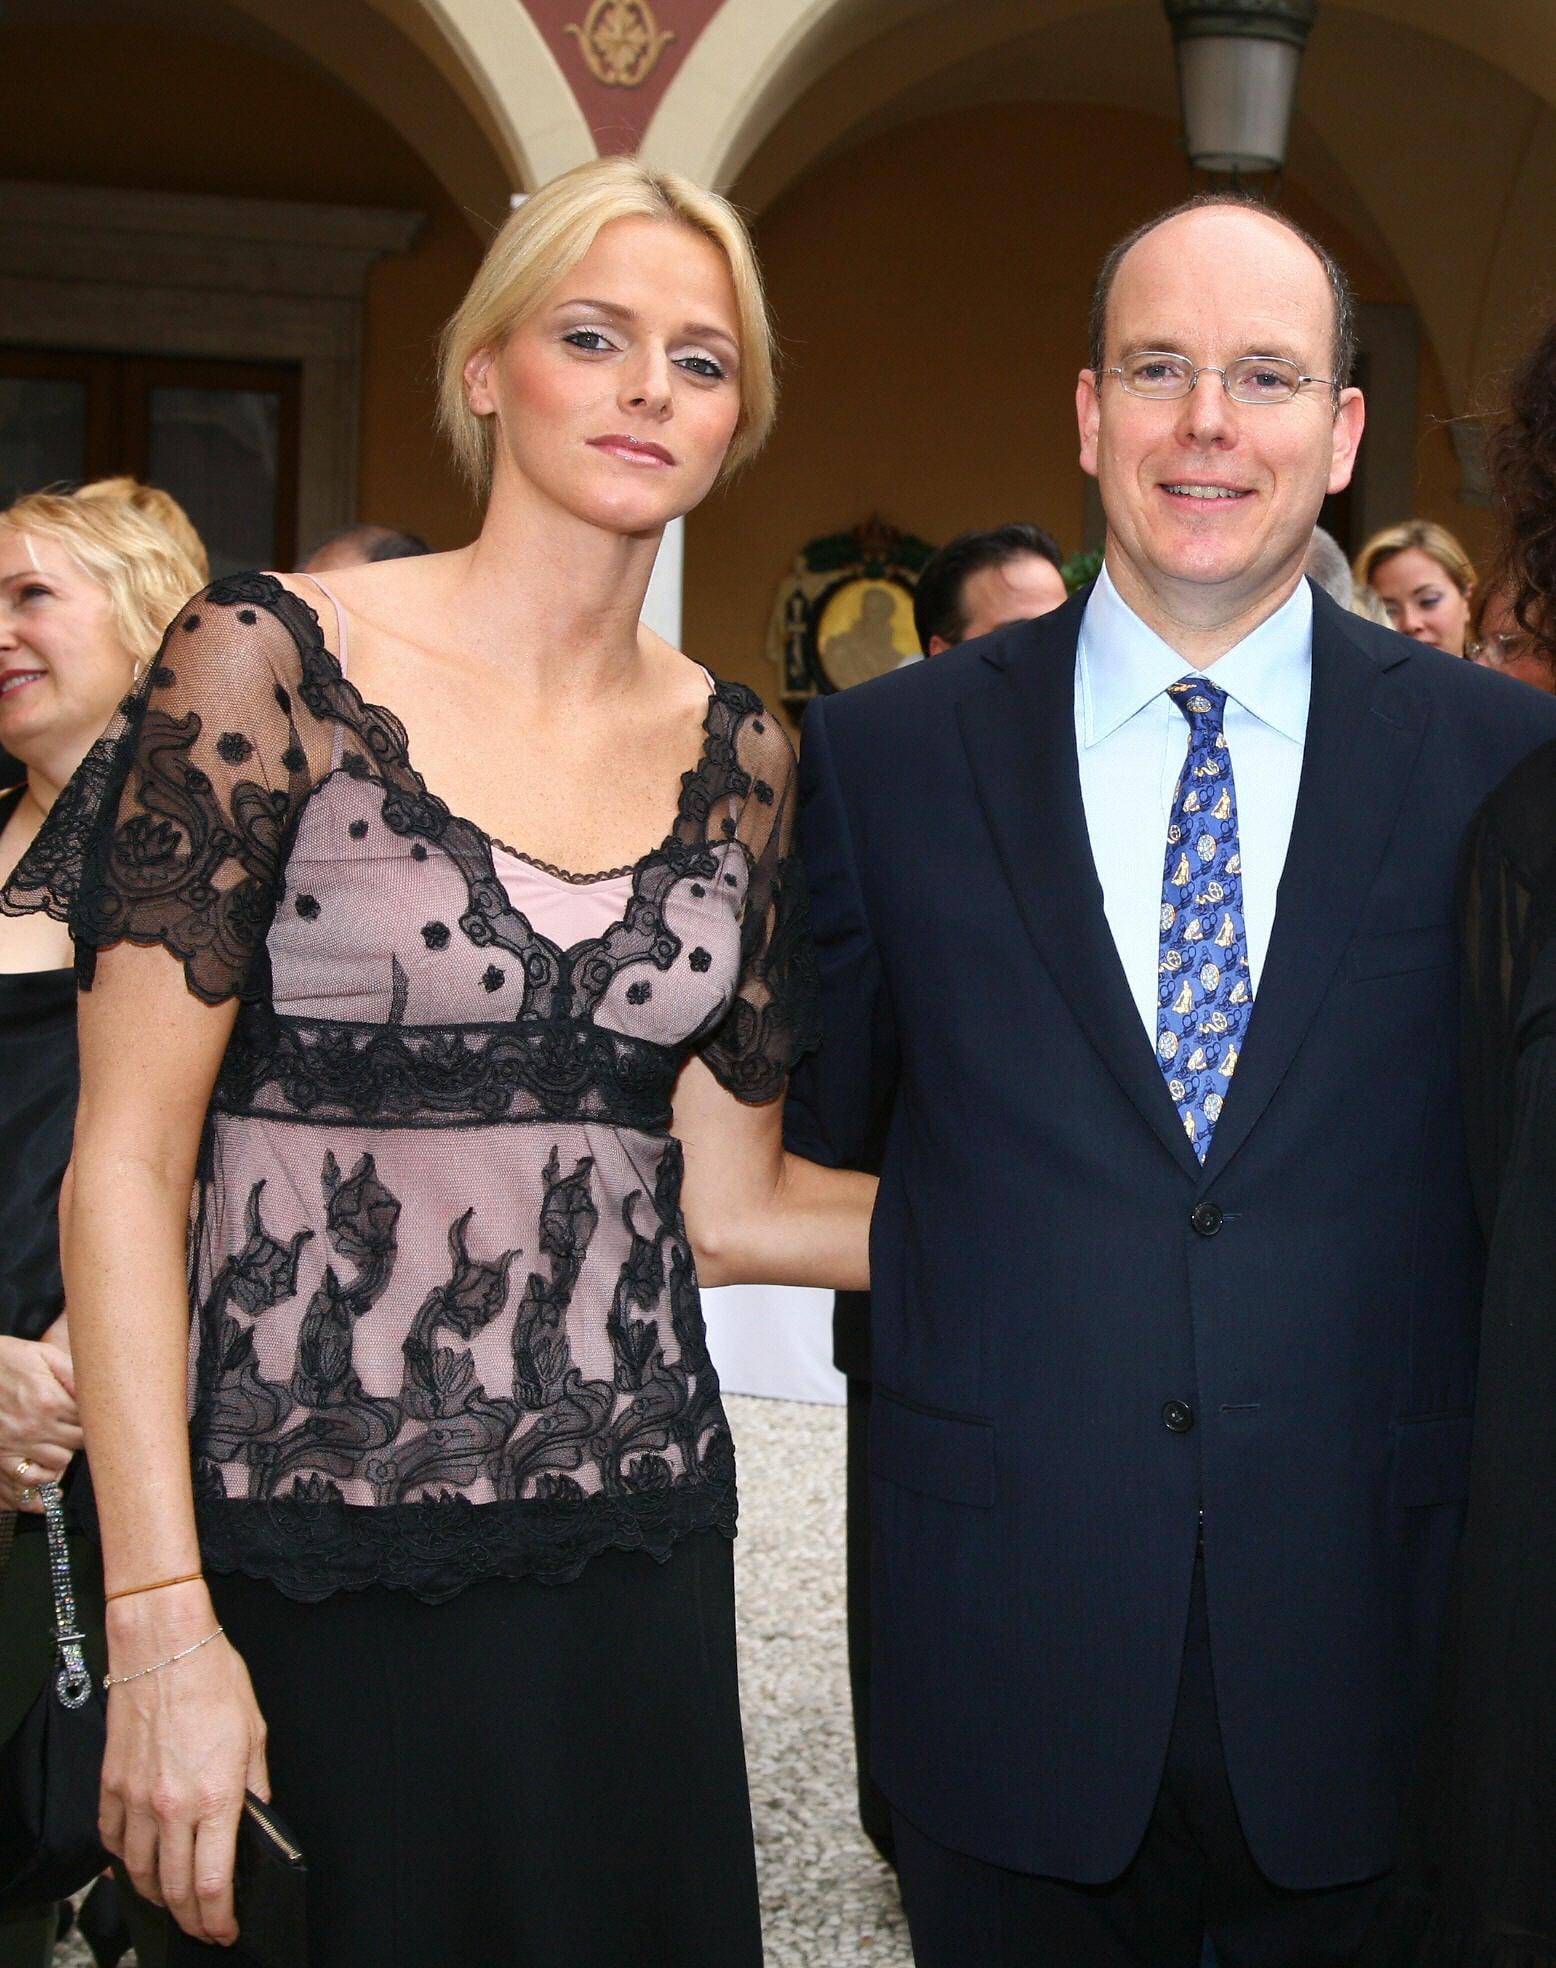 Charlene Wittstock and then-boyfriend Prince Albert struck a pose in 2007.